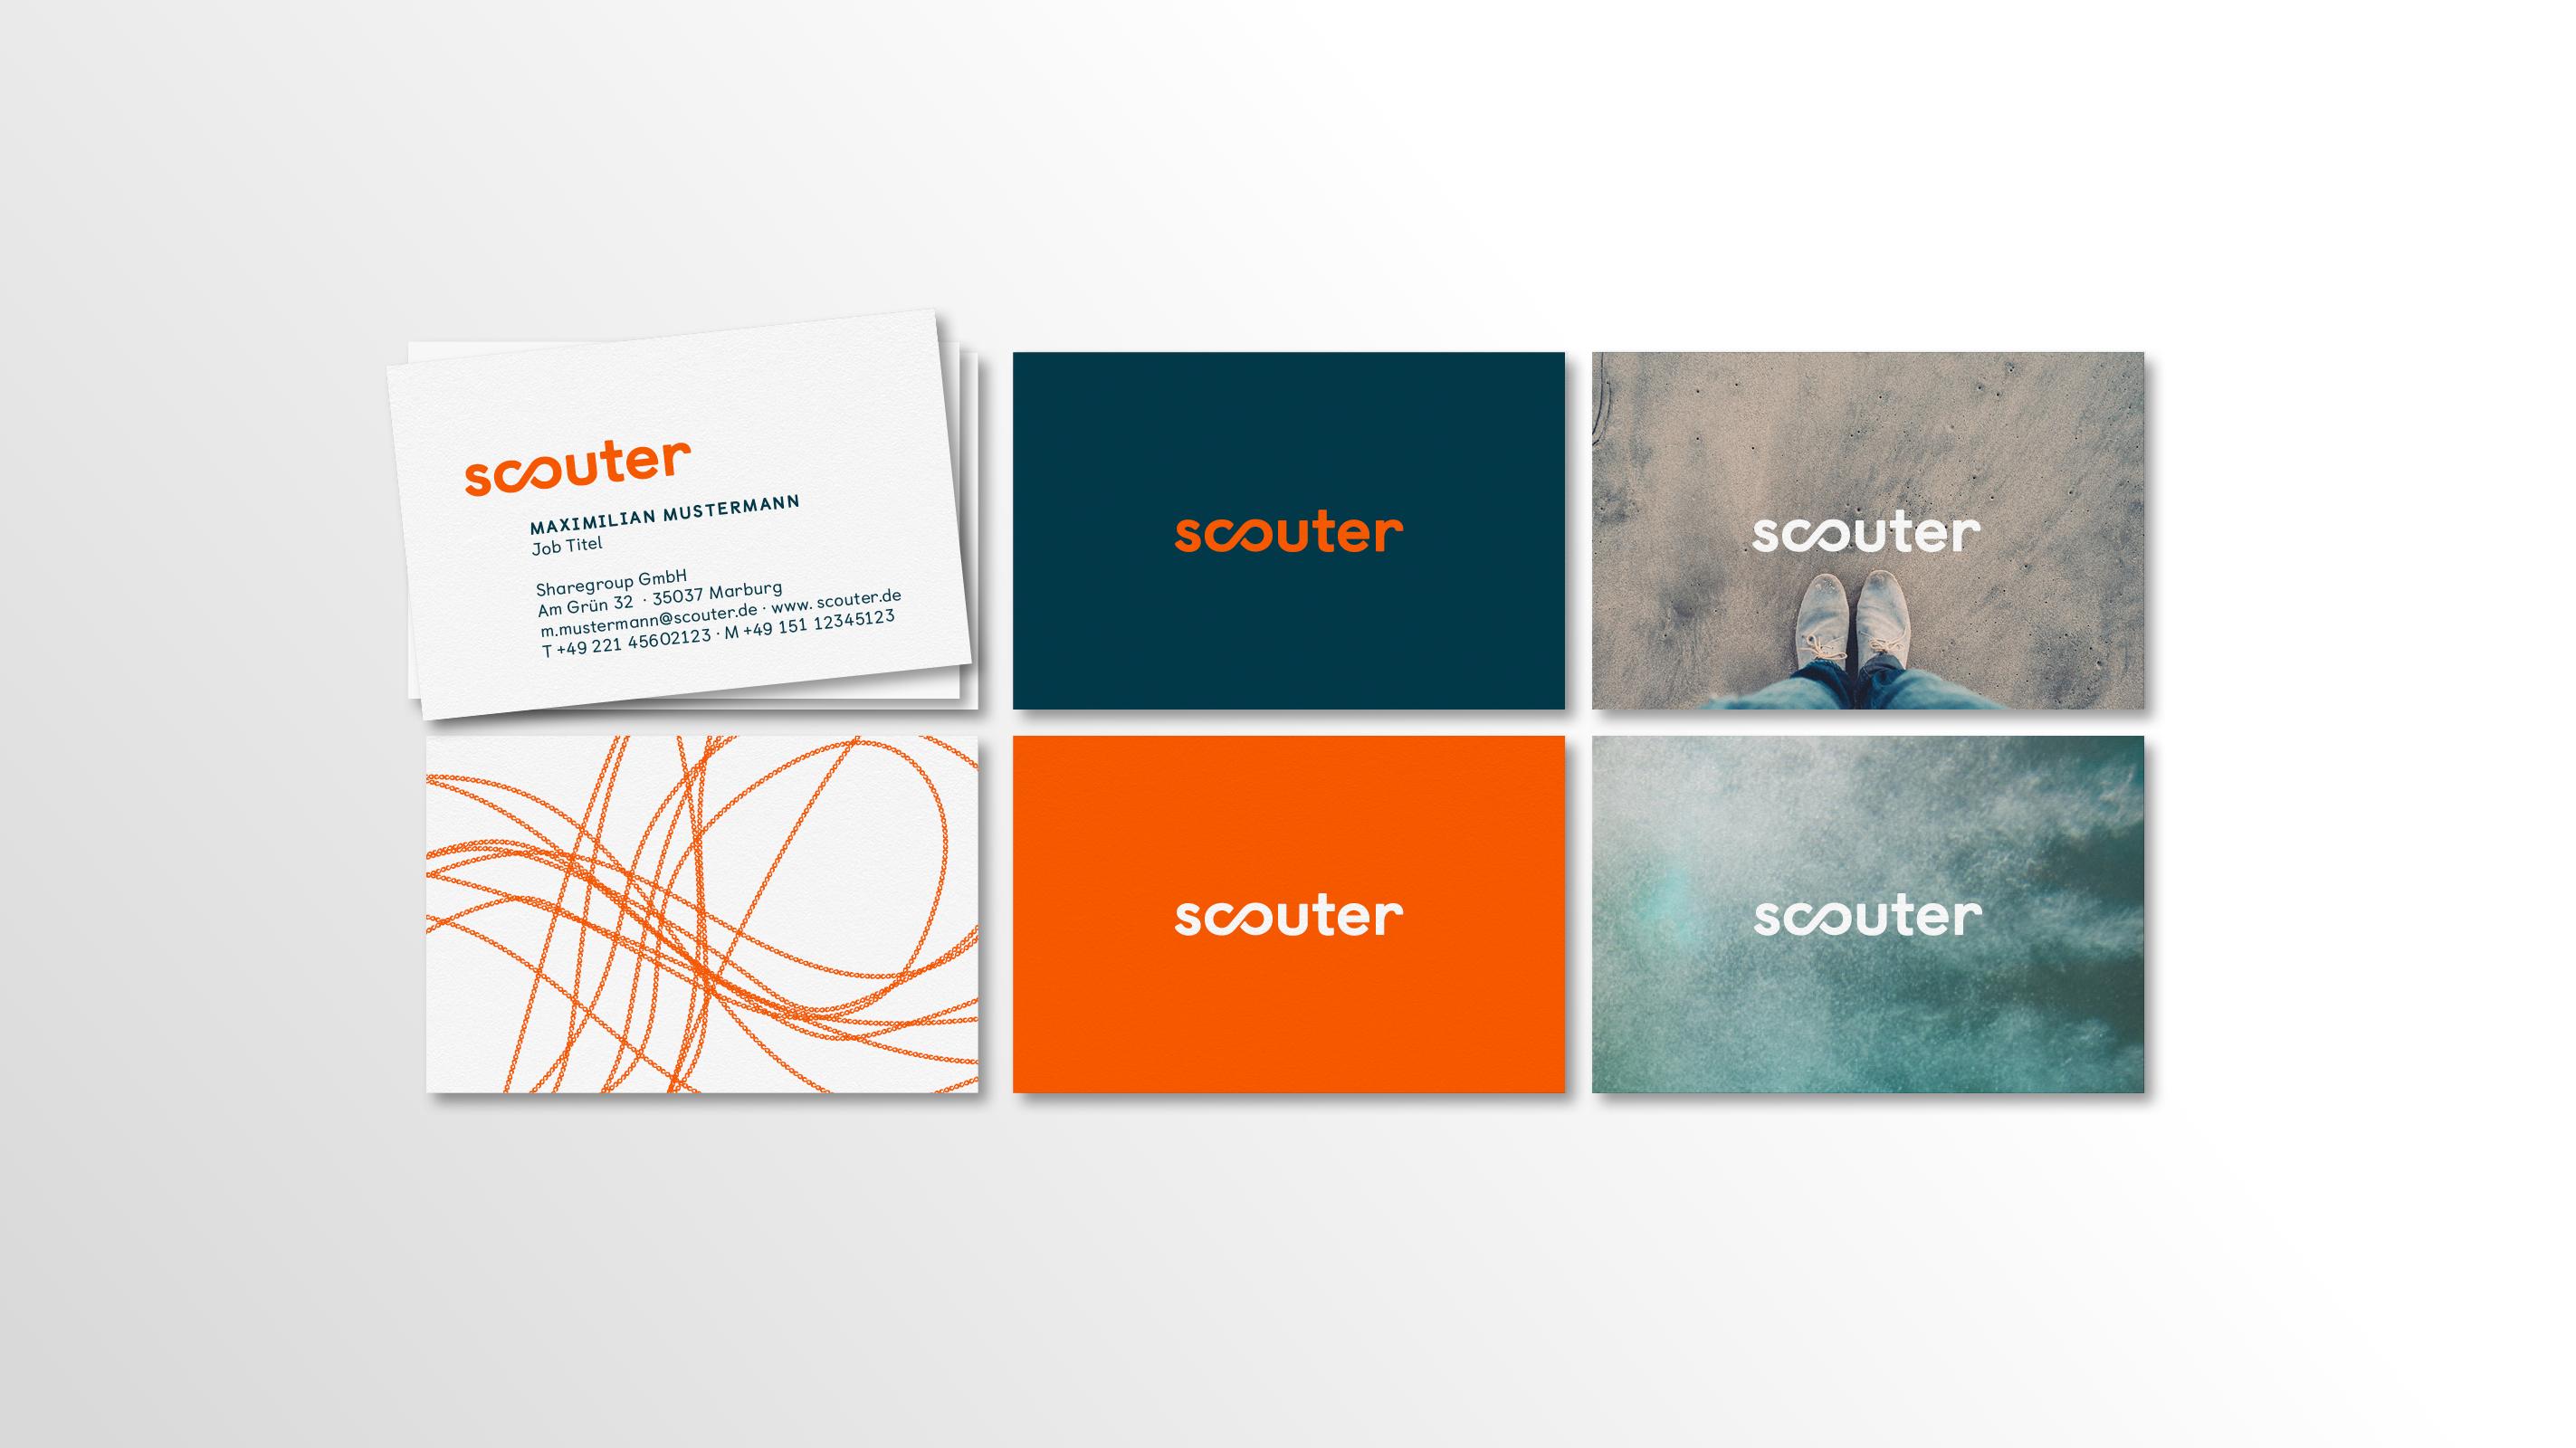 Scouter Carsharing – Poarangan Brand Design7